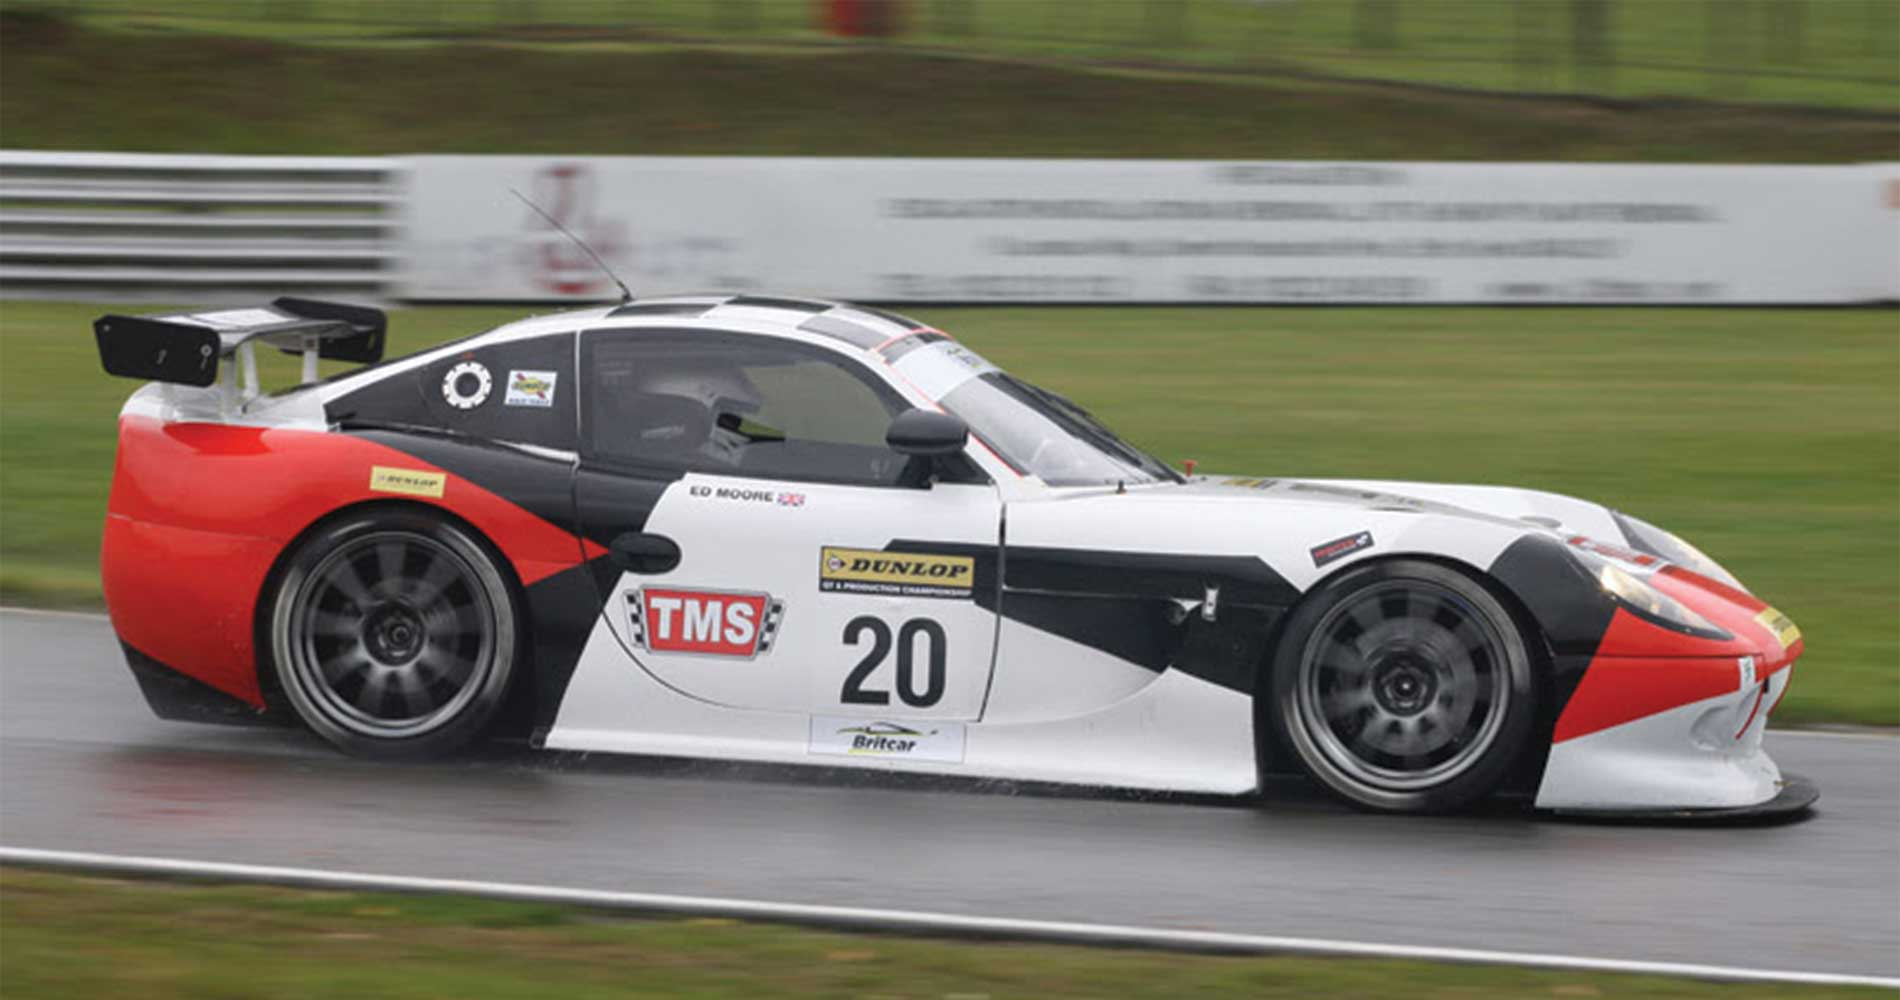 race-report-dunlop-gt-production-championship-brands-hatch-1213th-november-2016-motorsportdays-test-days-4